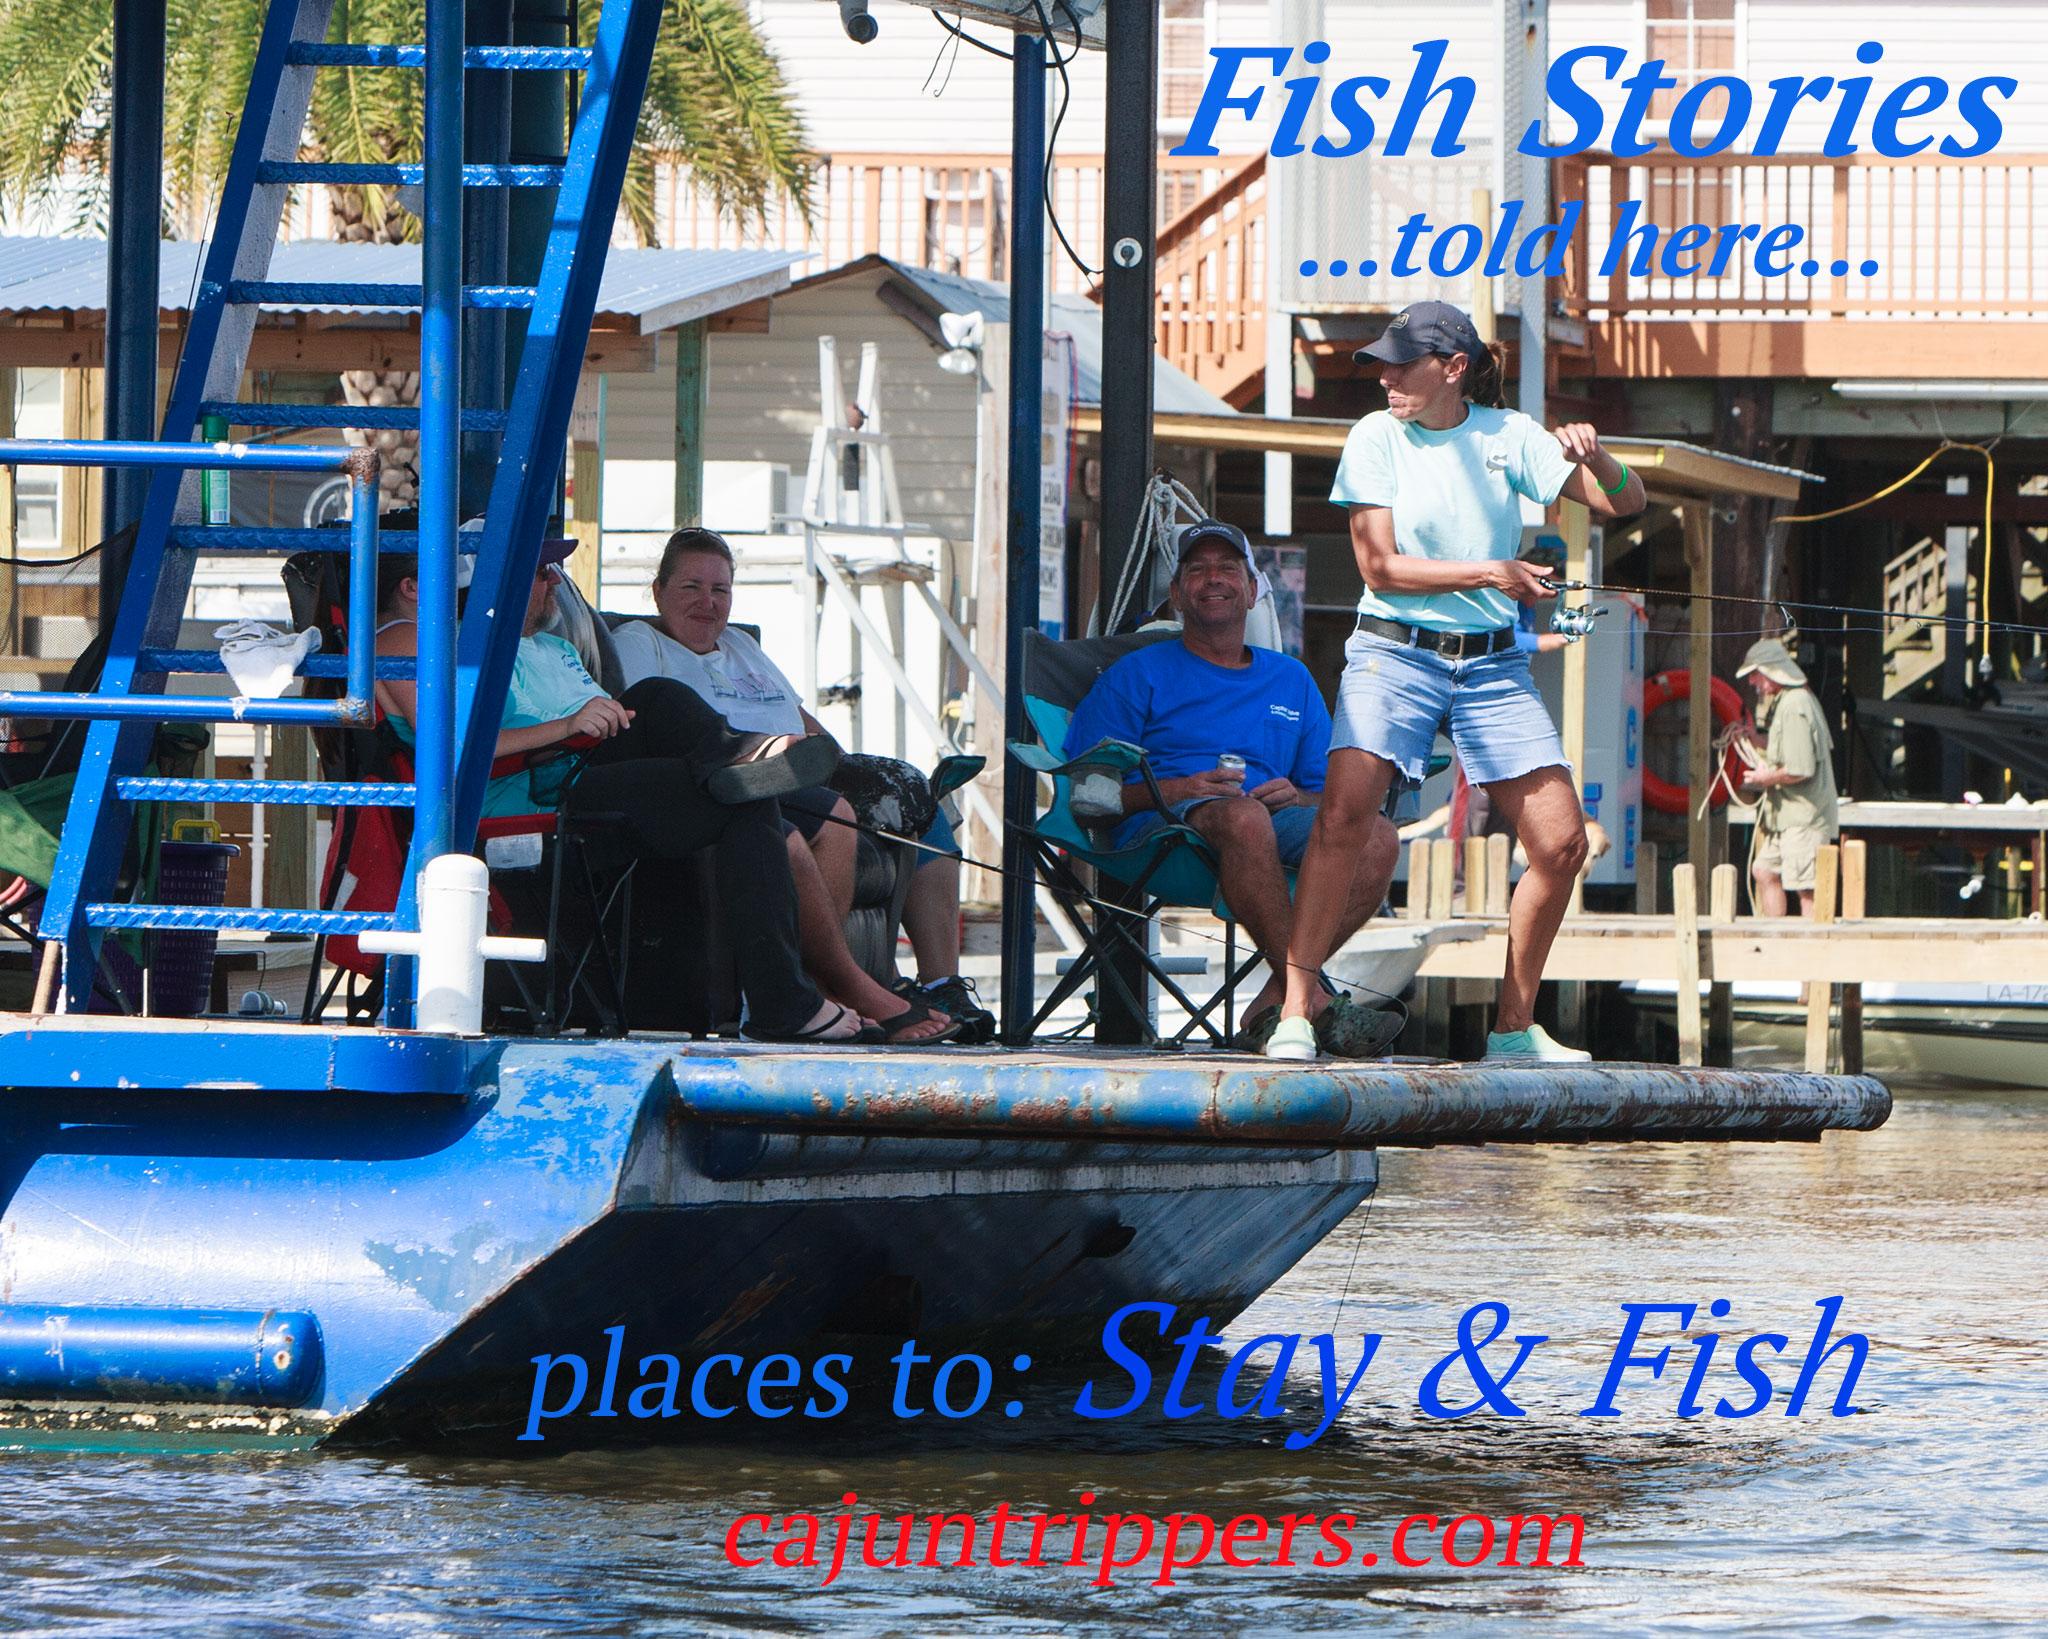 Salt Water Fishing in Pointe aux Chenes